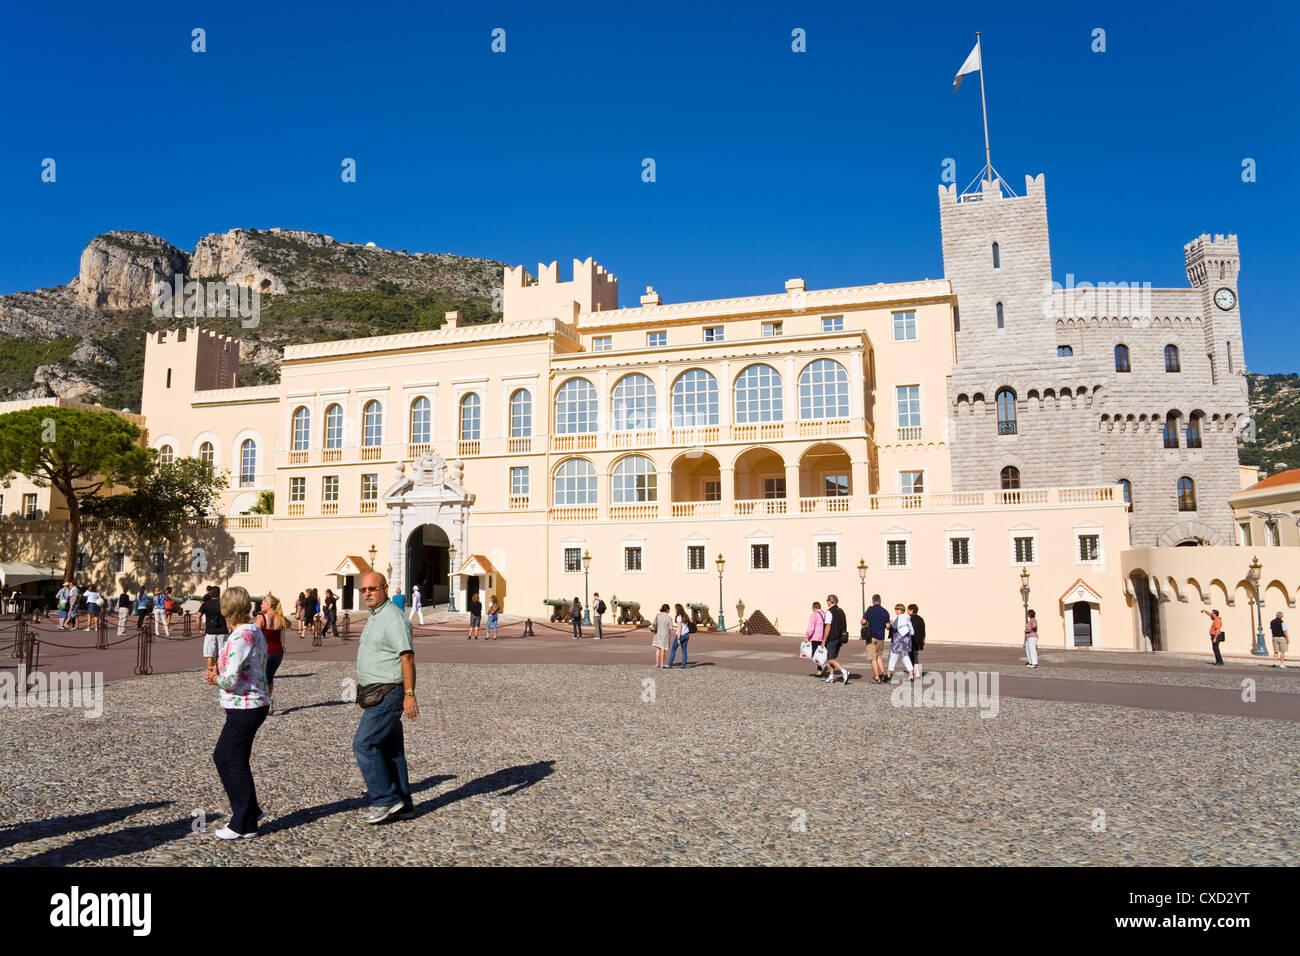 Princes Place in Old Monaco, Monte Carlo City, Monaco, Europe - Stock Image